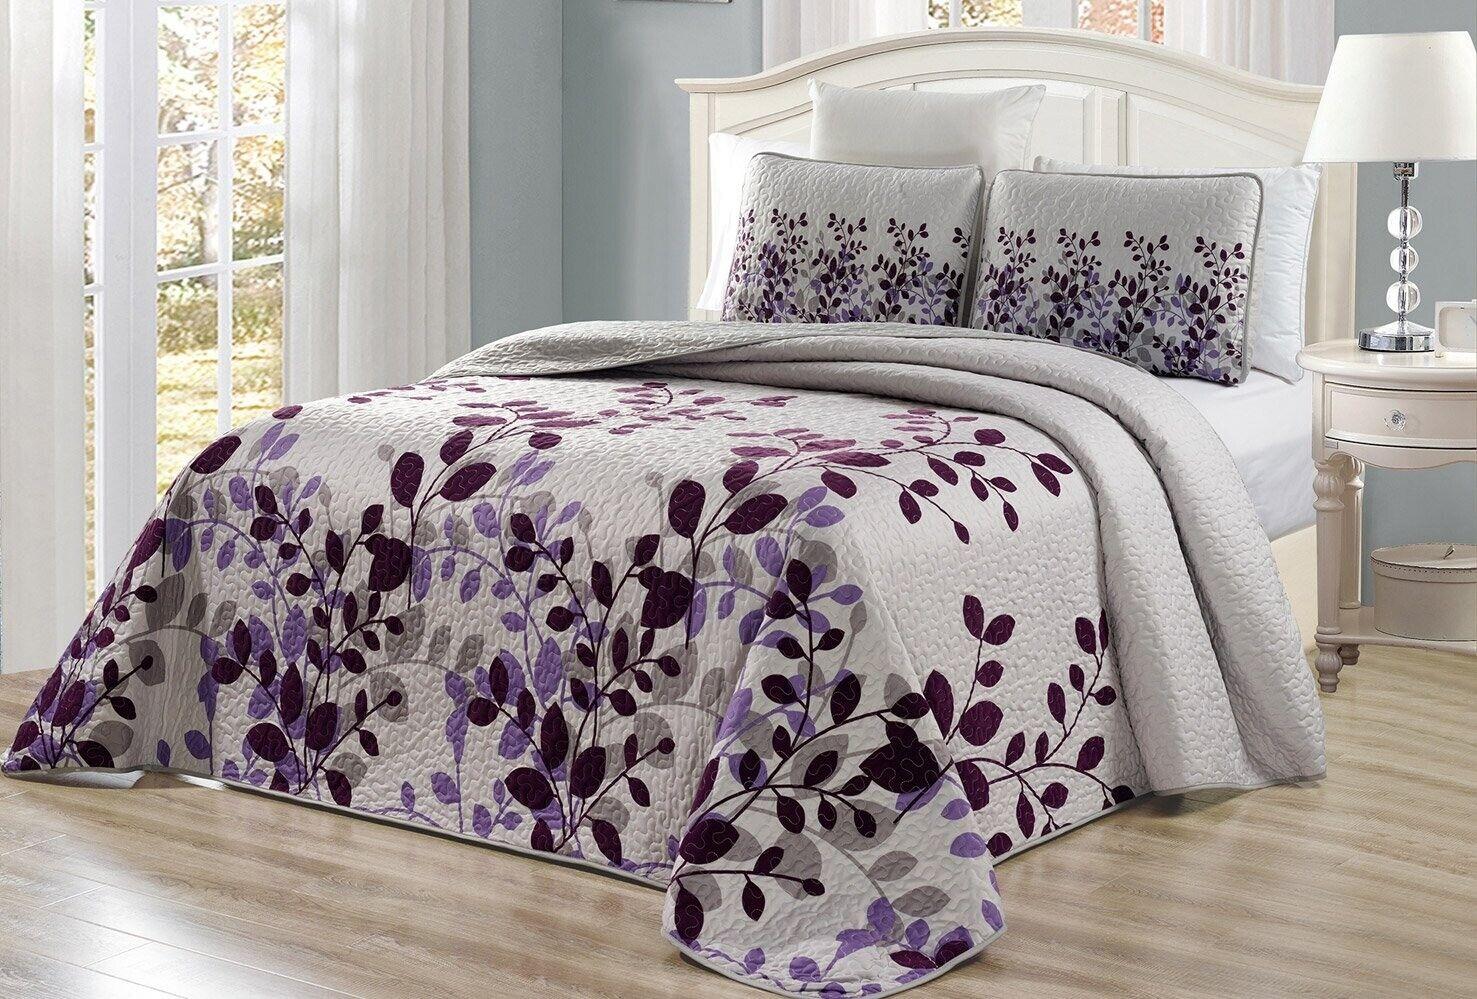 Purple Grey Viney Fresca Reversible Quilt CAL KING Size Coverlet Set Bedspread